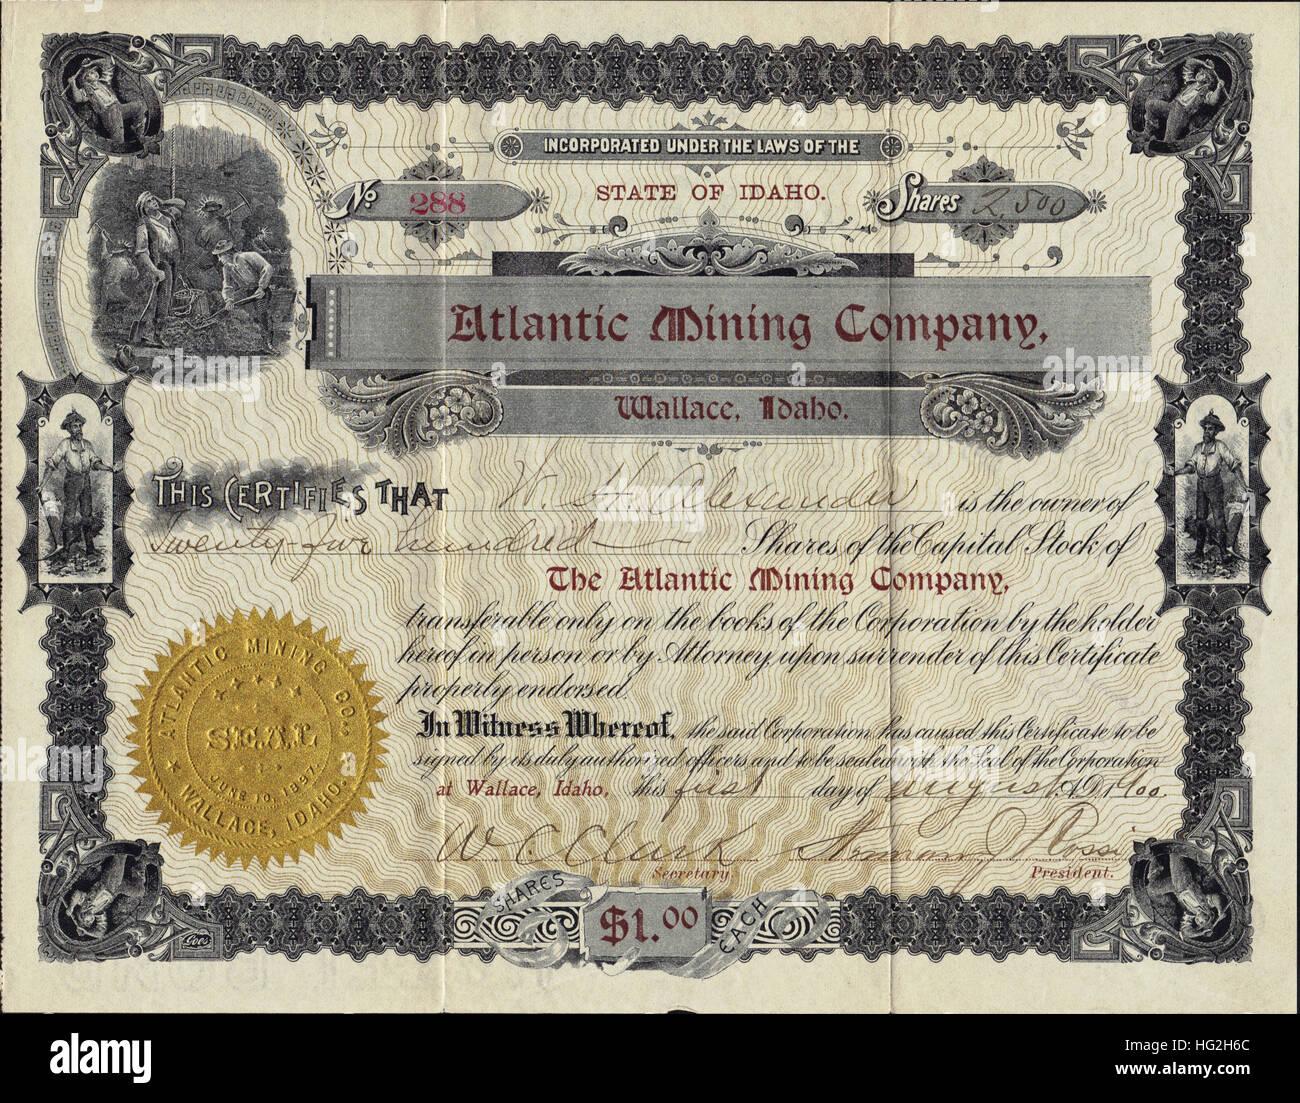 1900 Atlantic Mining Company Stock Certificate - Lead Silver Mine - Wallace Idaho - USA - Stock Image